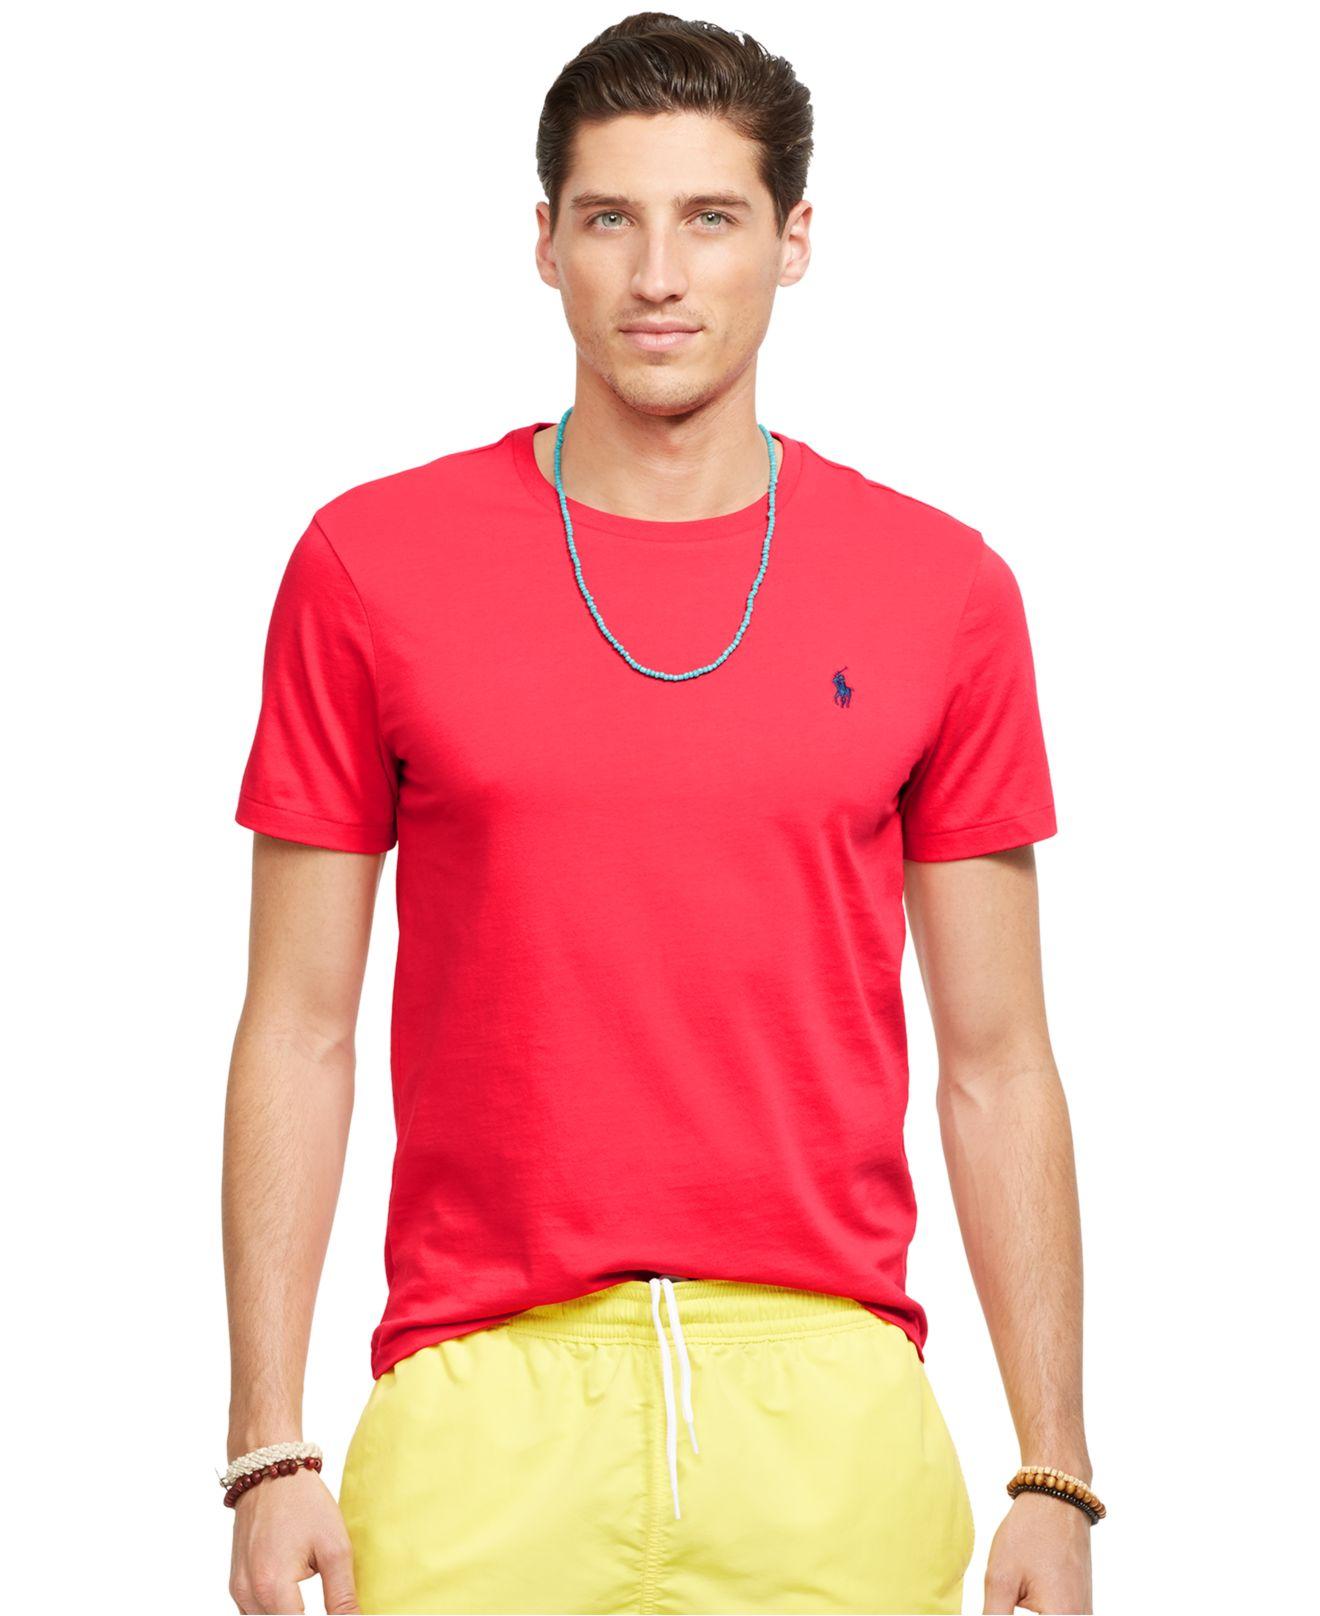 Polo ralph lauren custom fit jersey t shirt in red for men for Polo custom fit t shirts